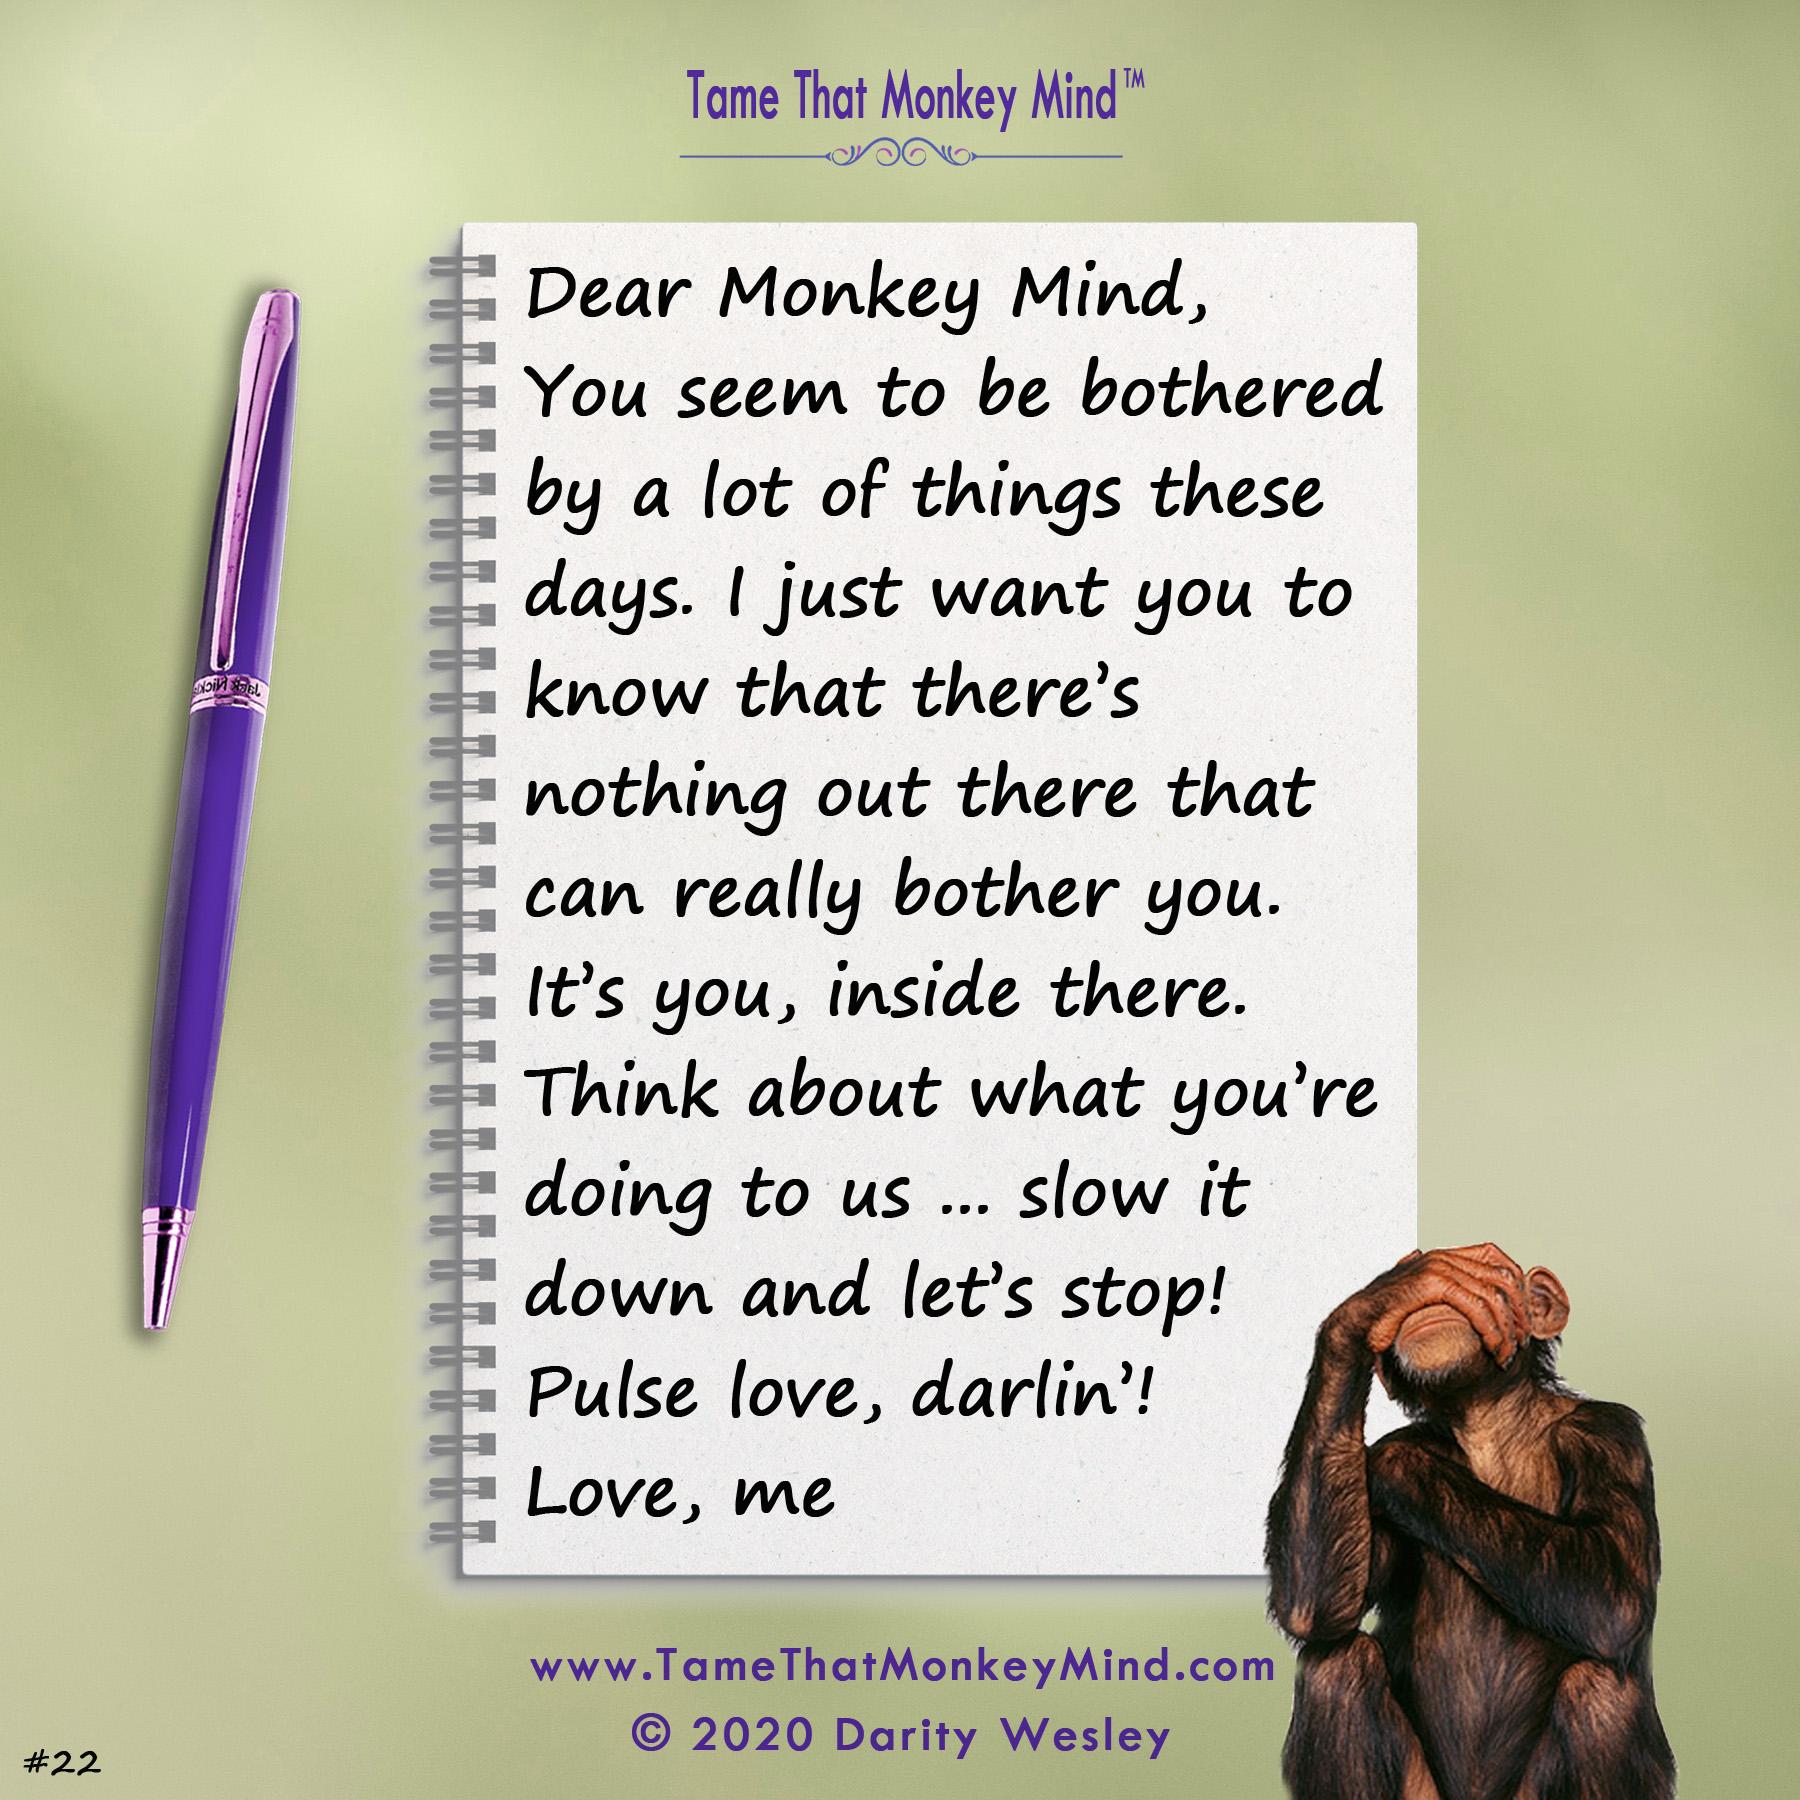 Dear Monkey Mind #22